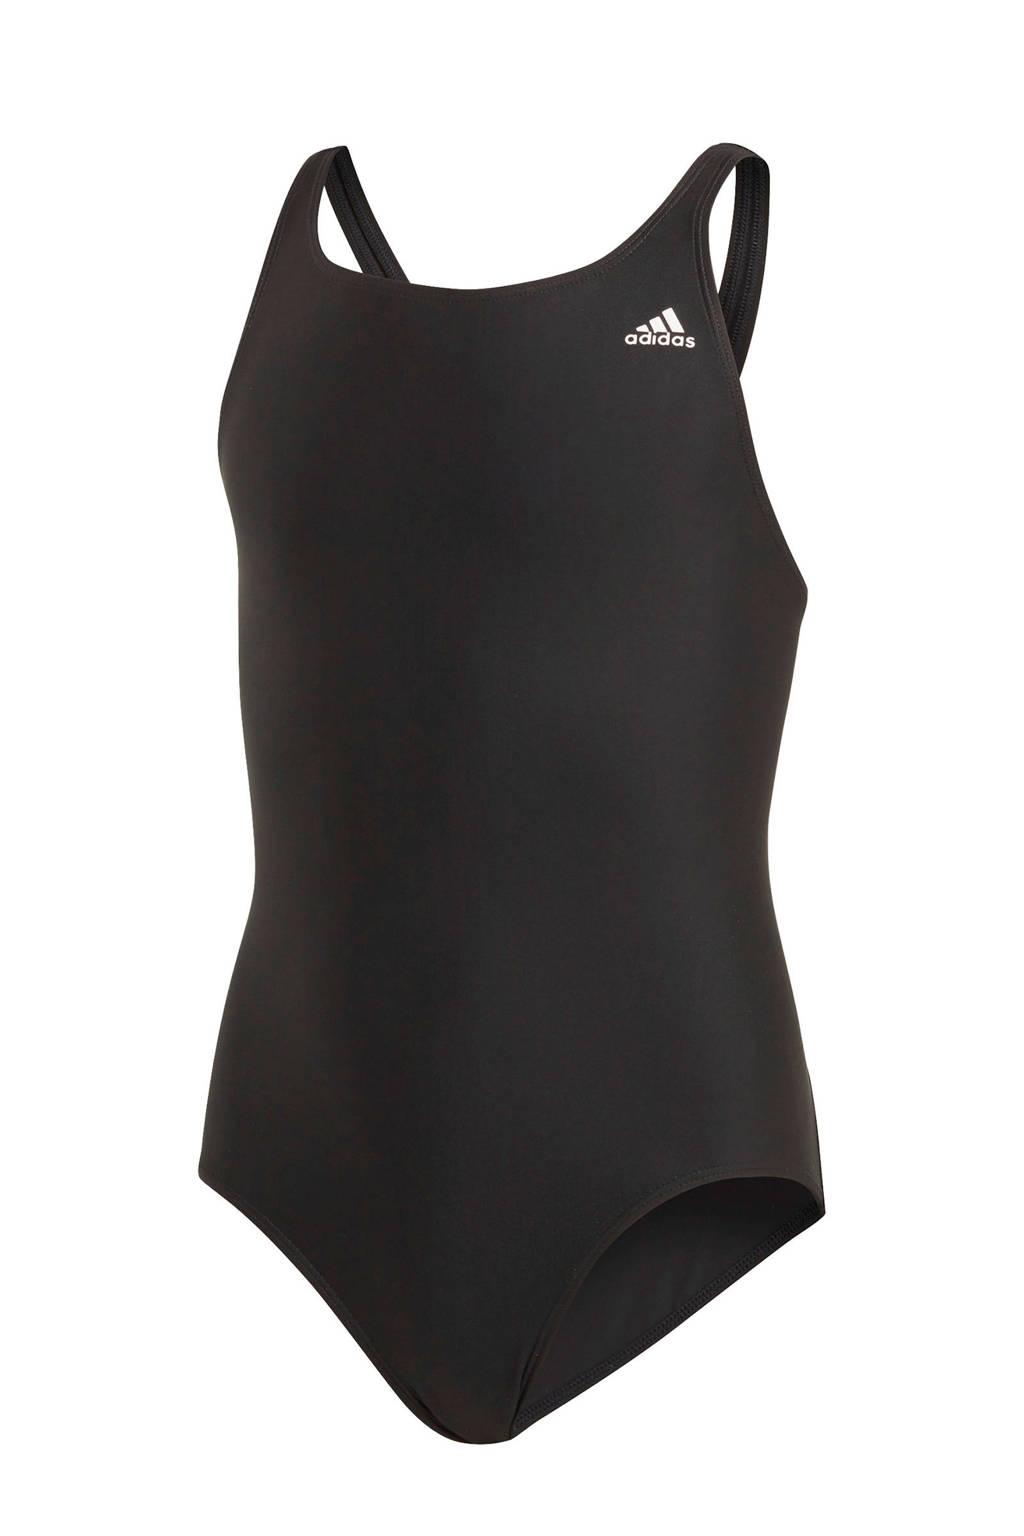 adidas Performance infinitex sportbadpak zwart, Zwart